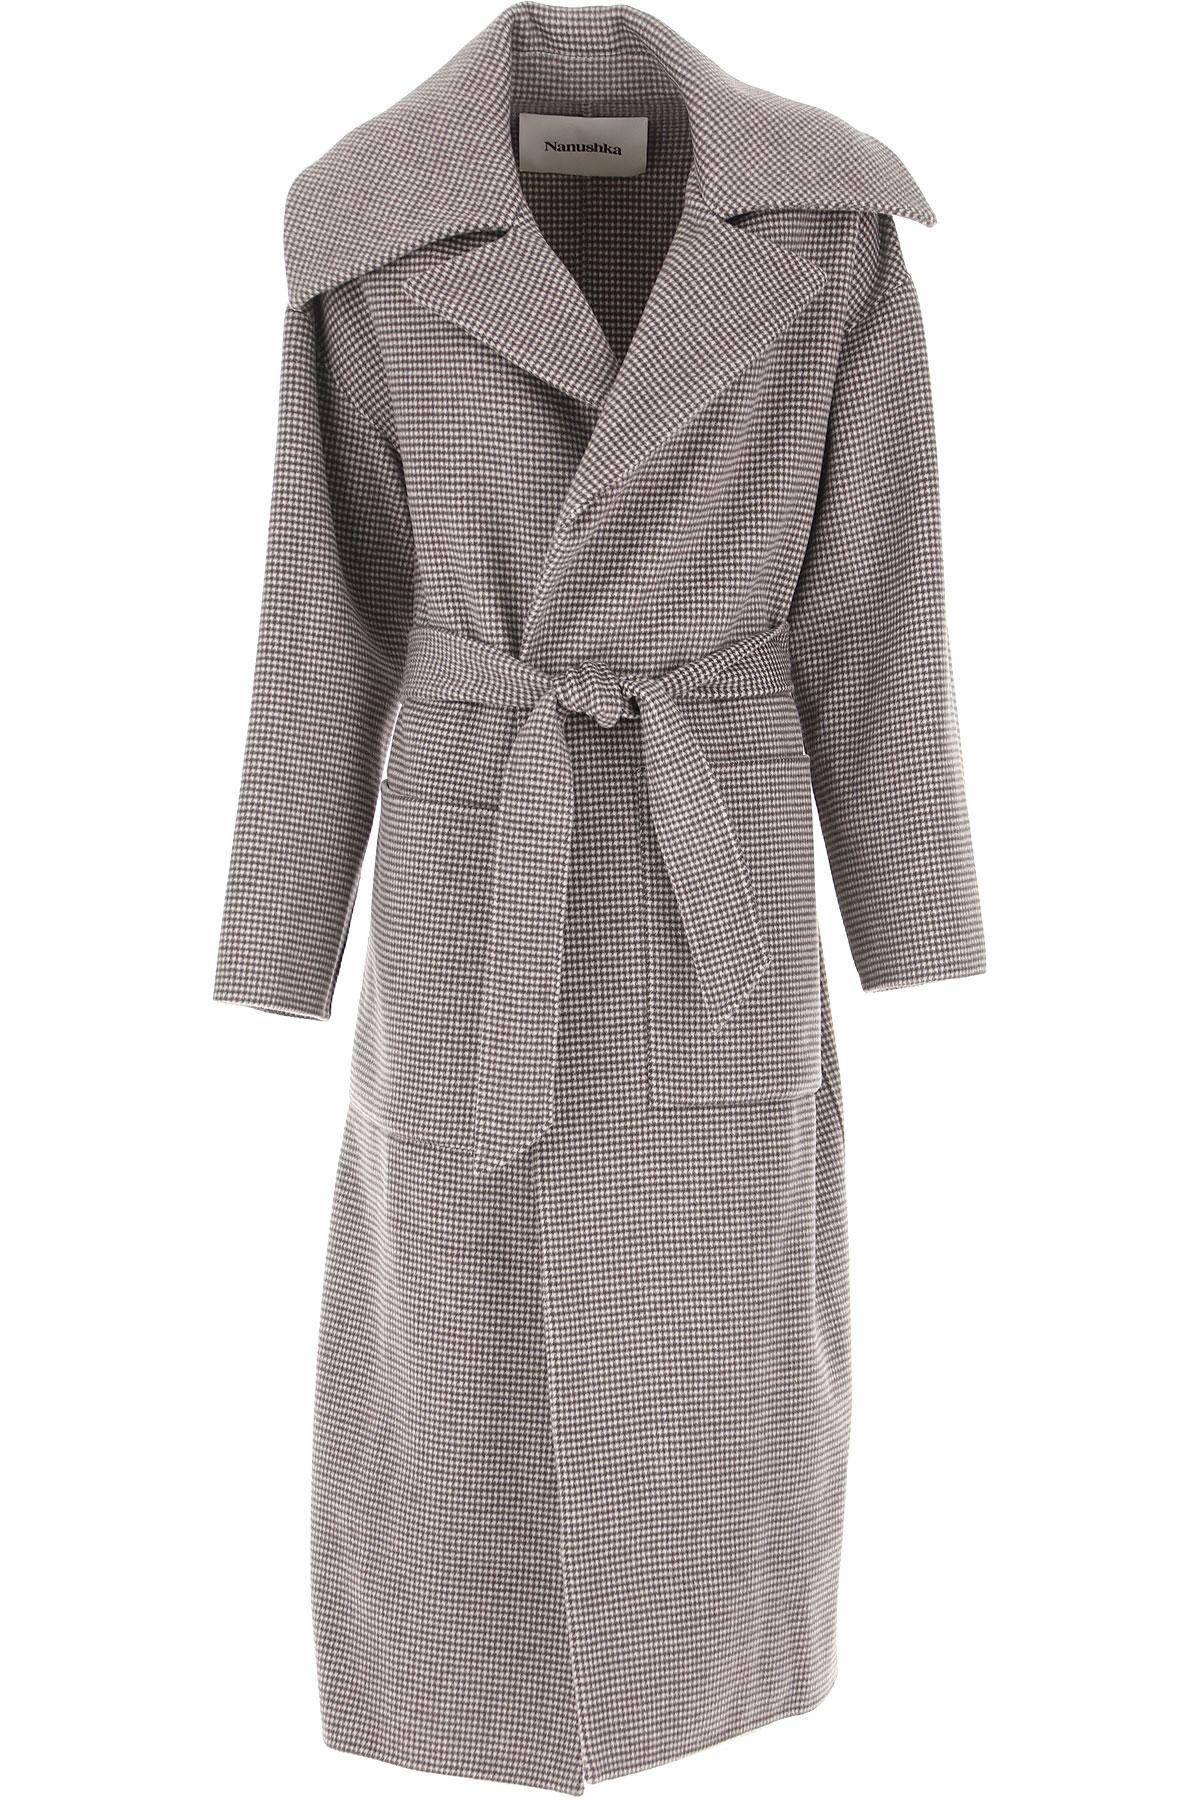 Nanushka Women's Coat, Brown, Wool, 2021, 6 8